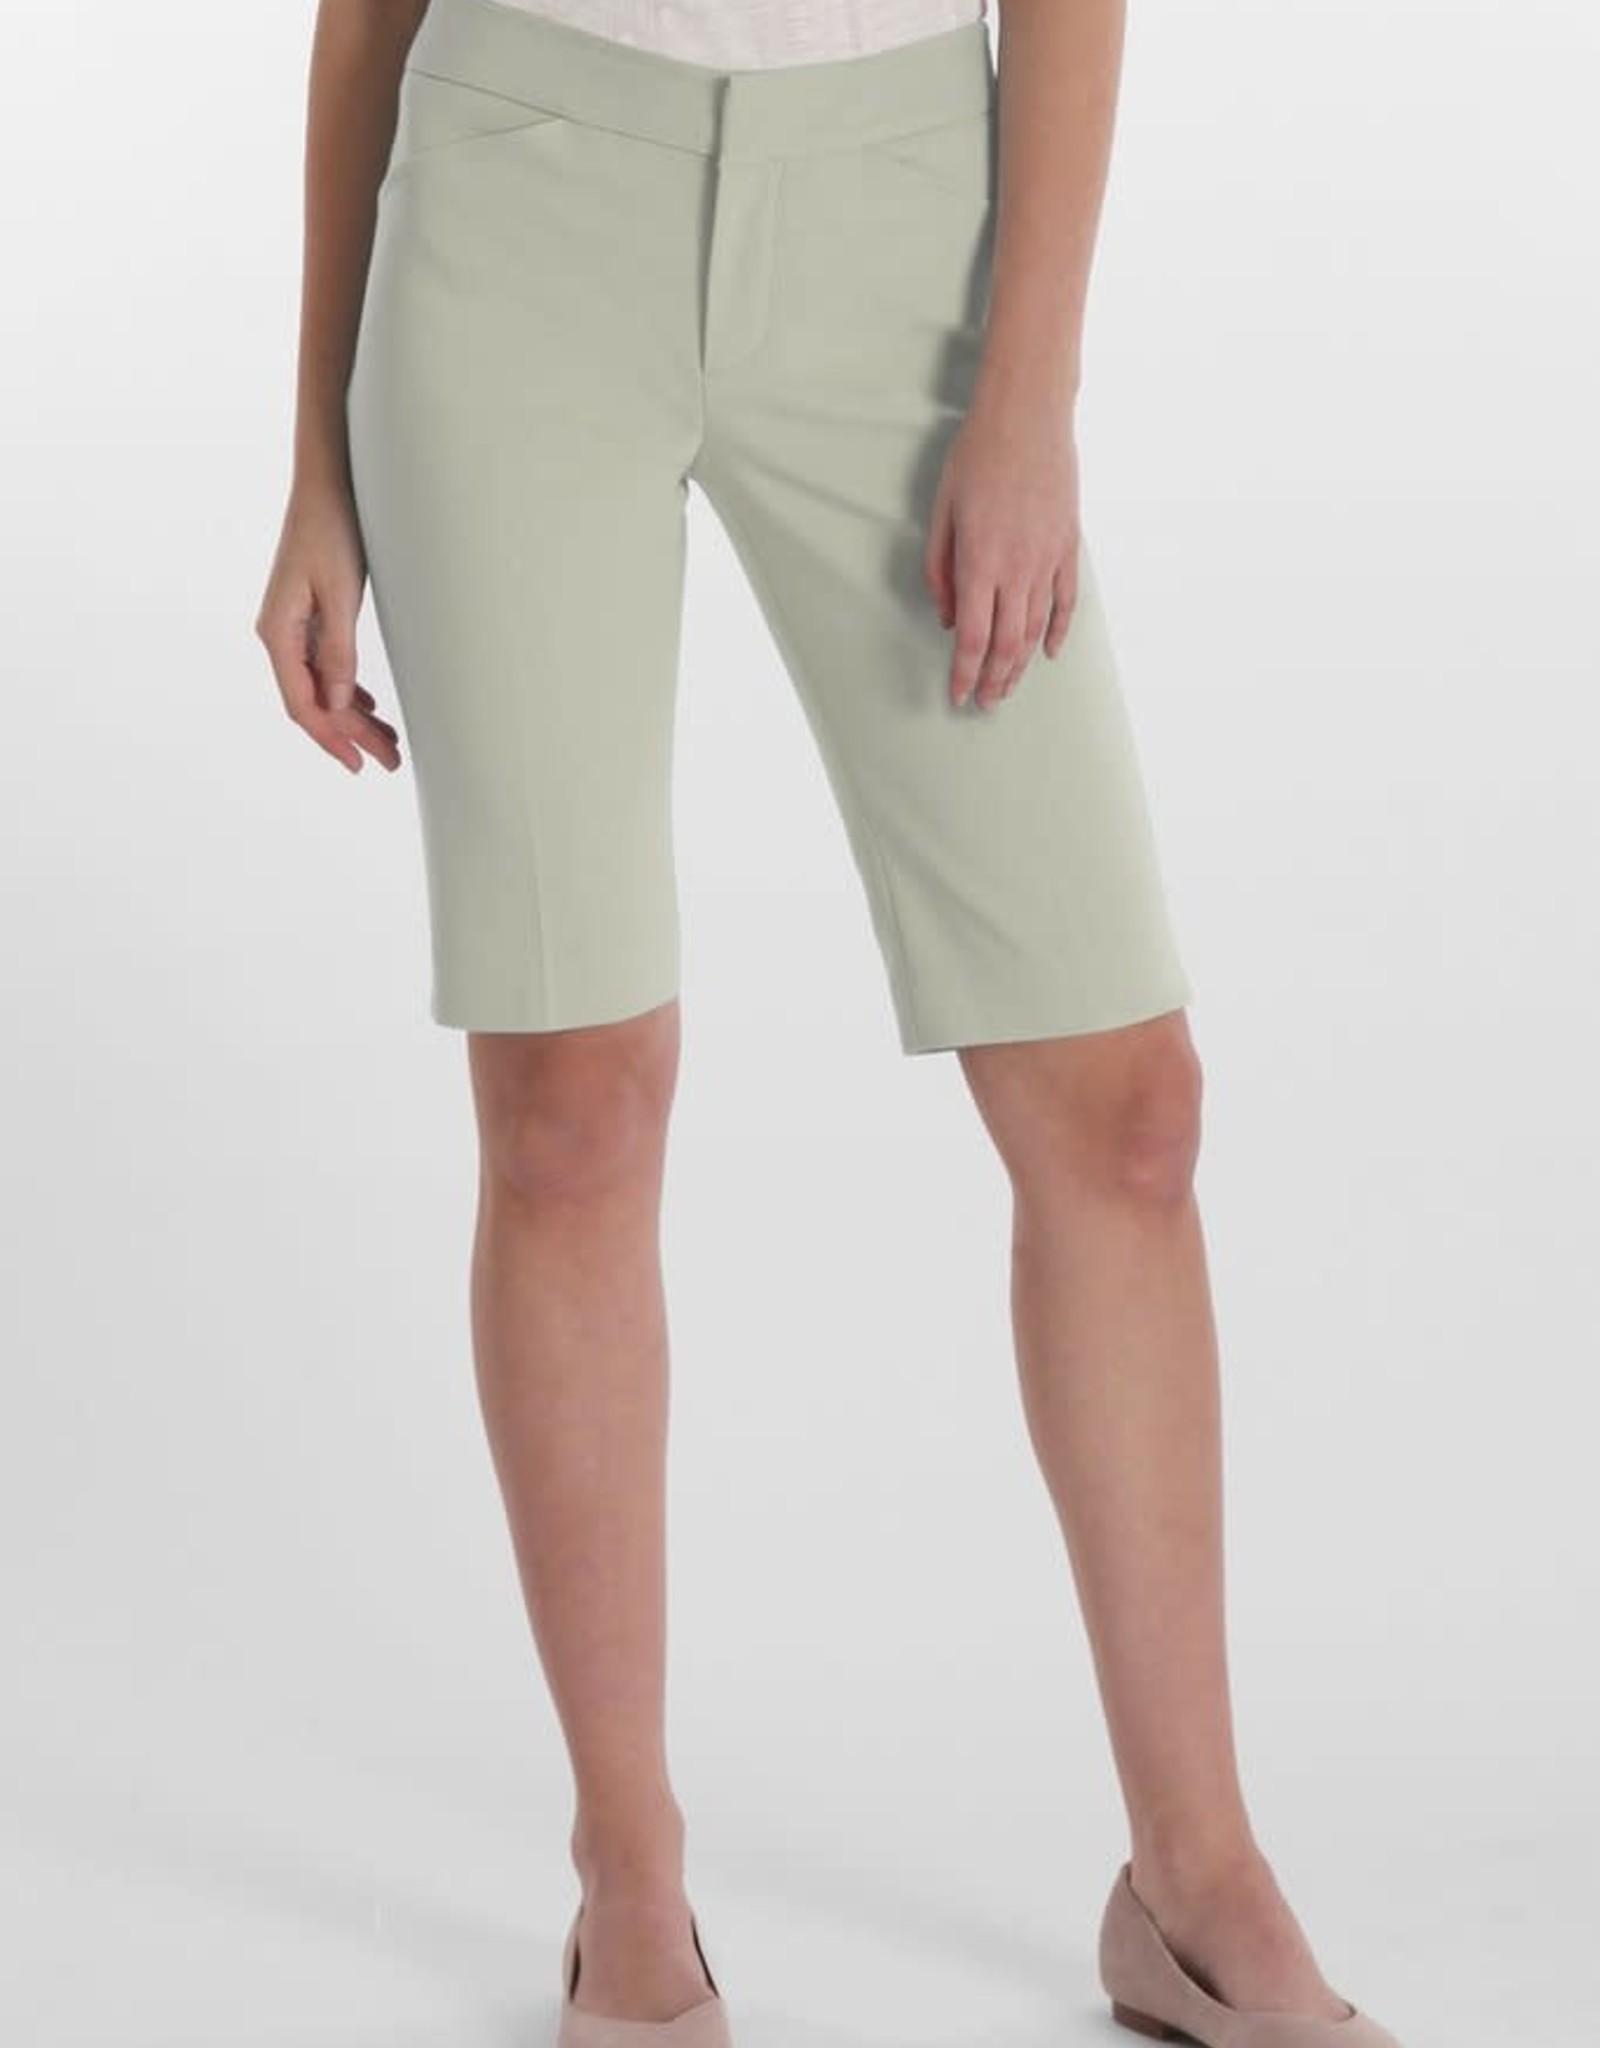 PEACE OF CLOTH - Premier Stretch Short